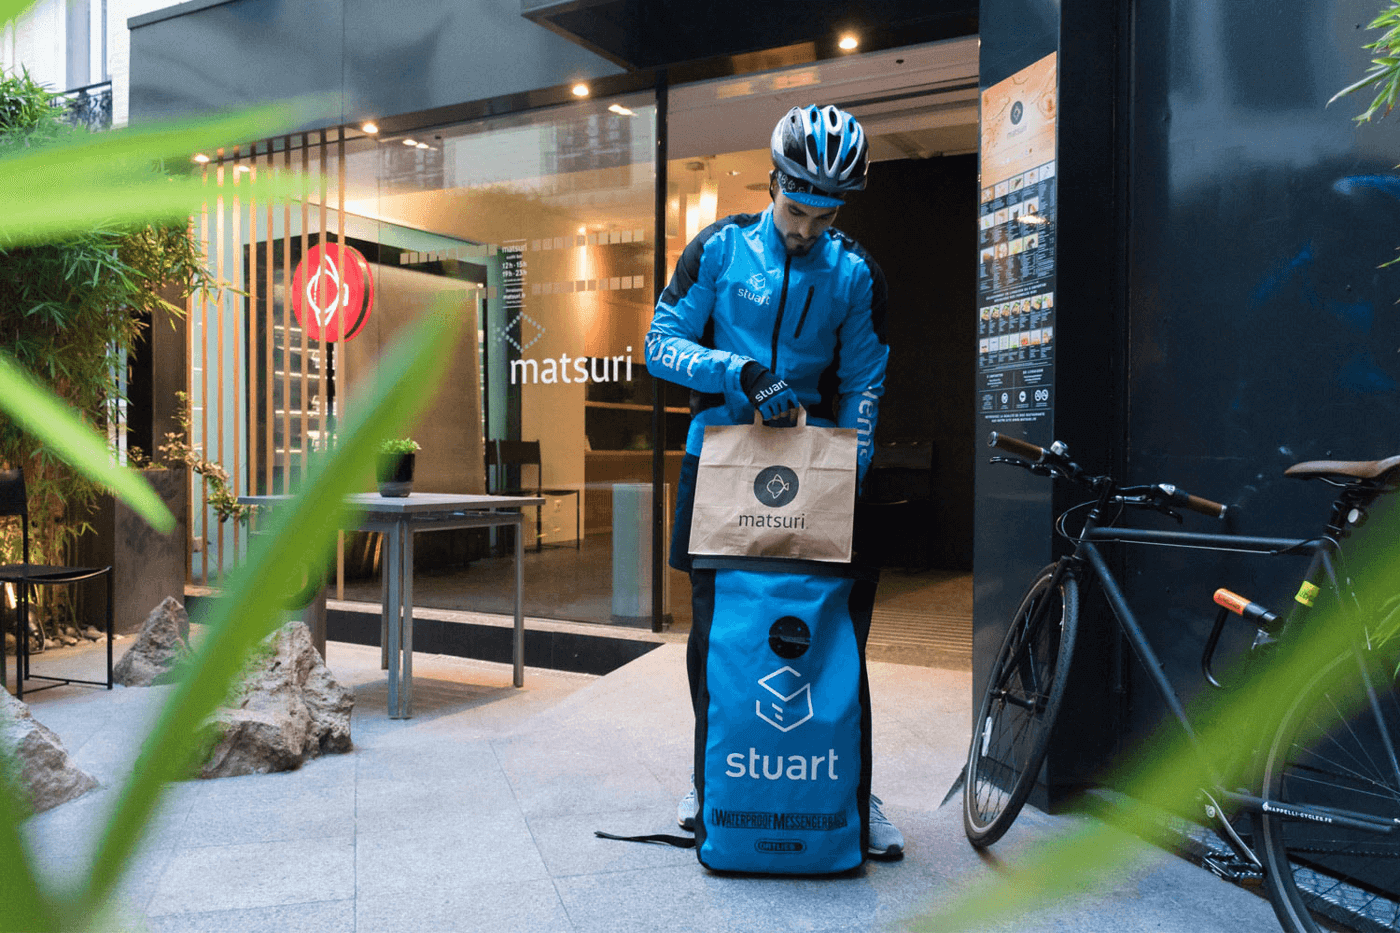 Matsuri food delivery